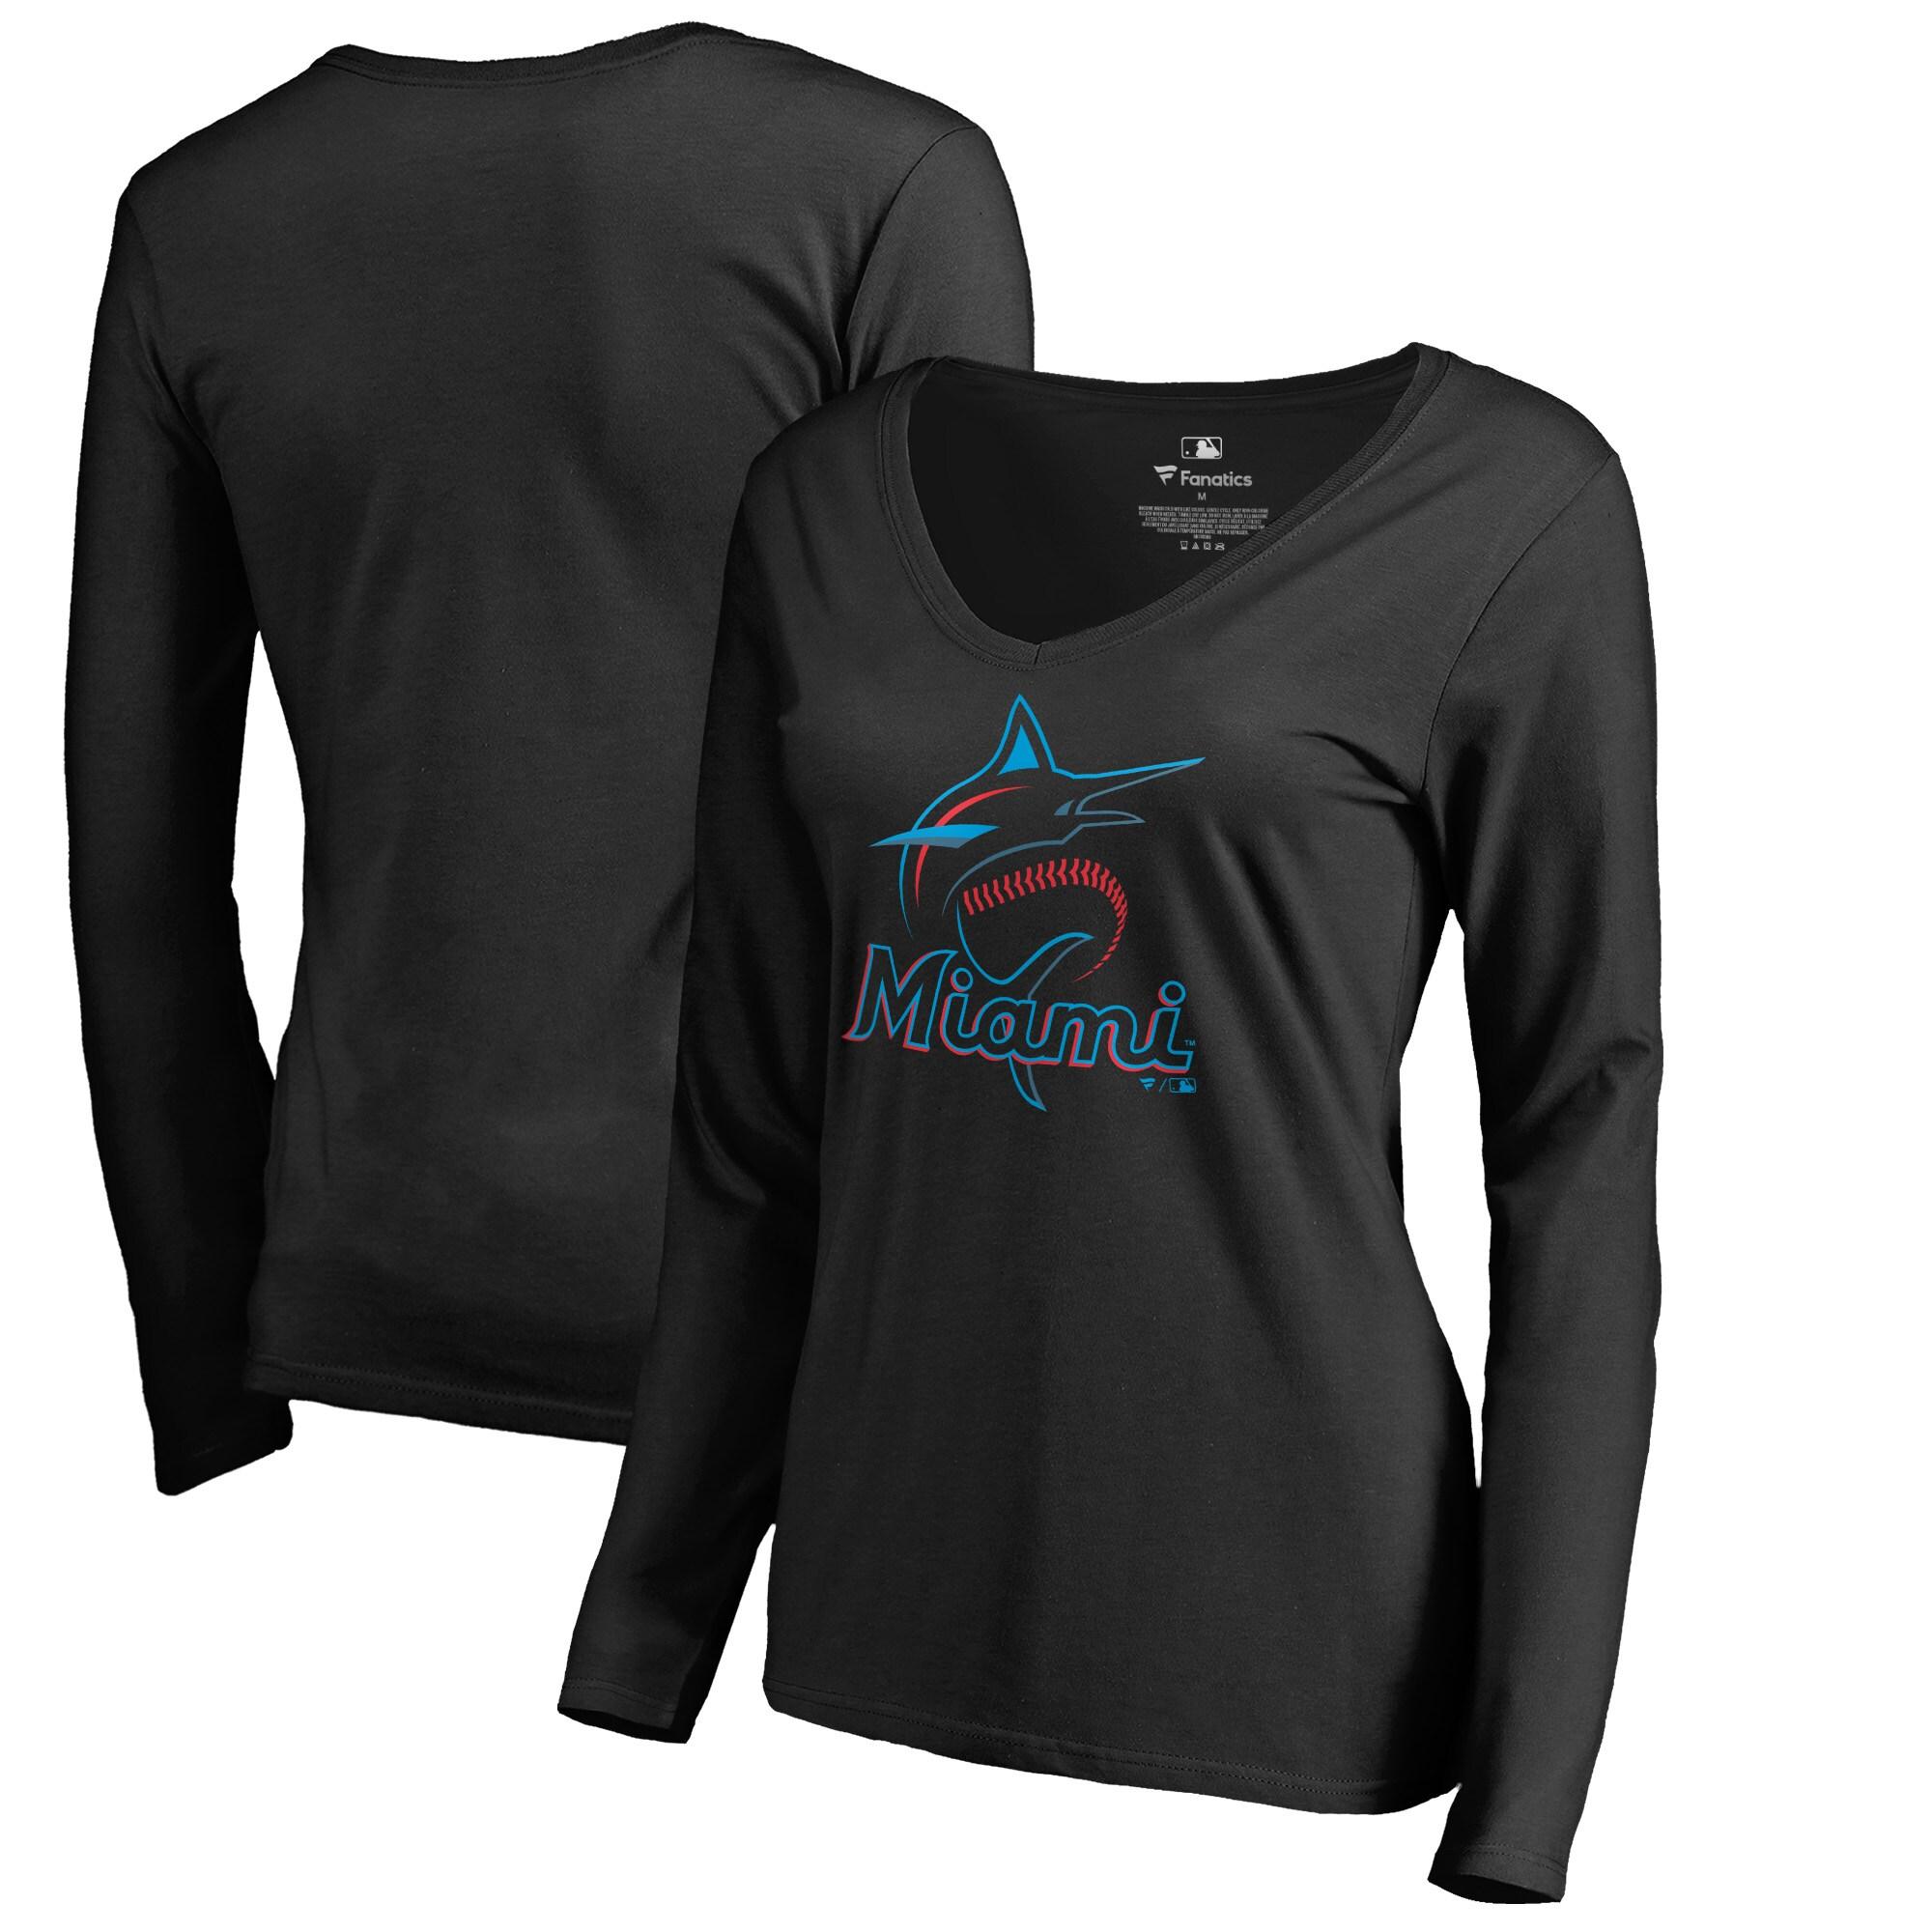 Miami Marlins Women's Team Color Primary Logo V-Neck Long Sleeve T-Shirt - Black